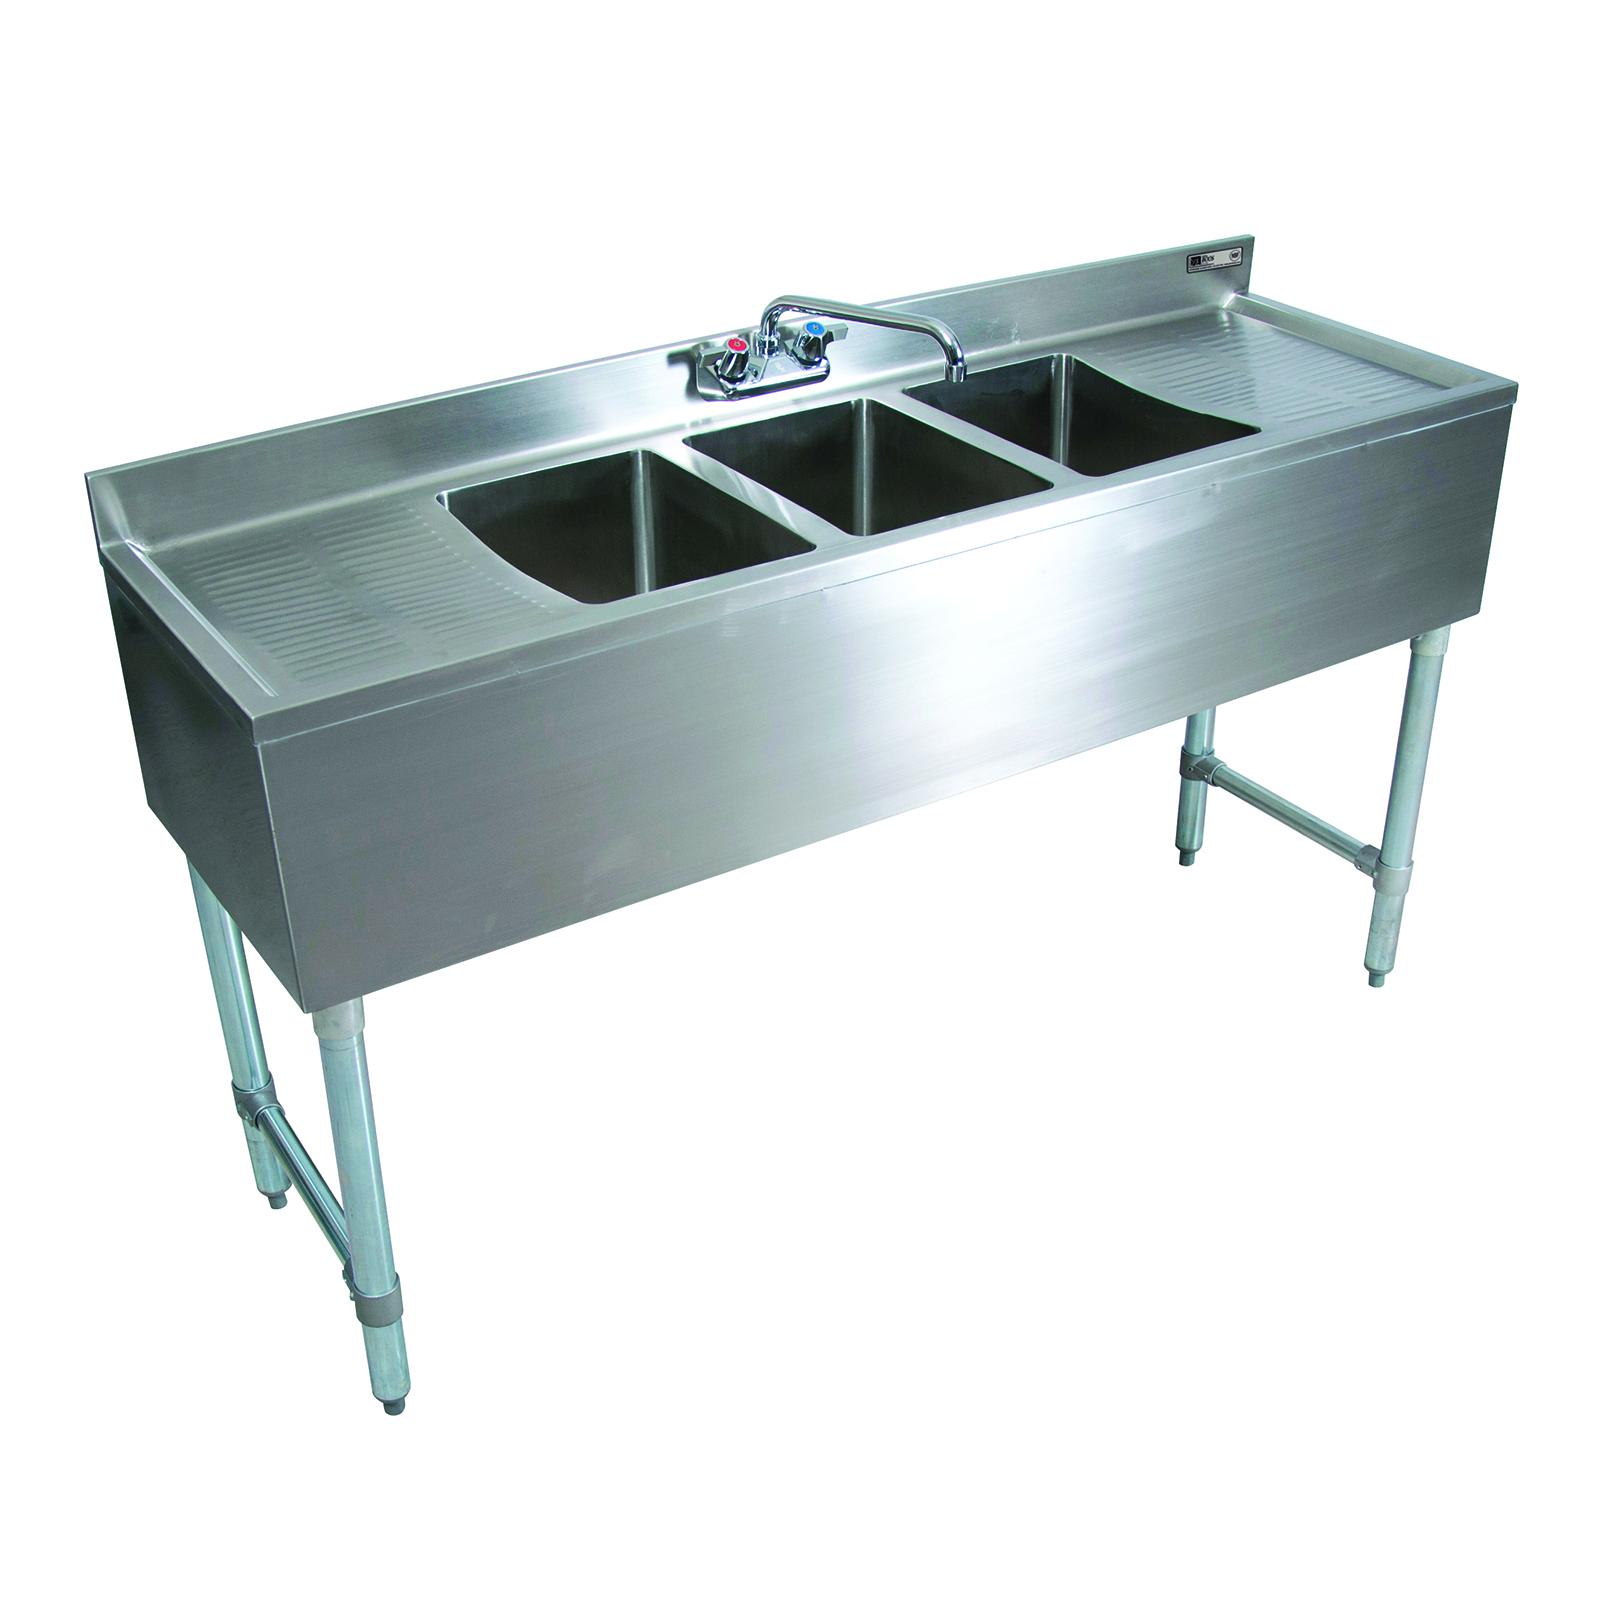 John Boos EUB4S84SL-2D underbar sink units